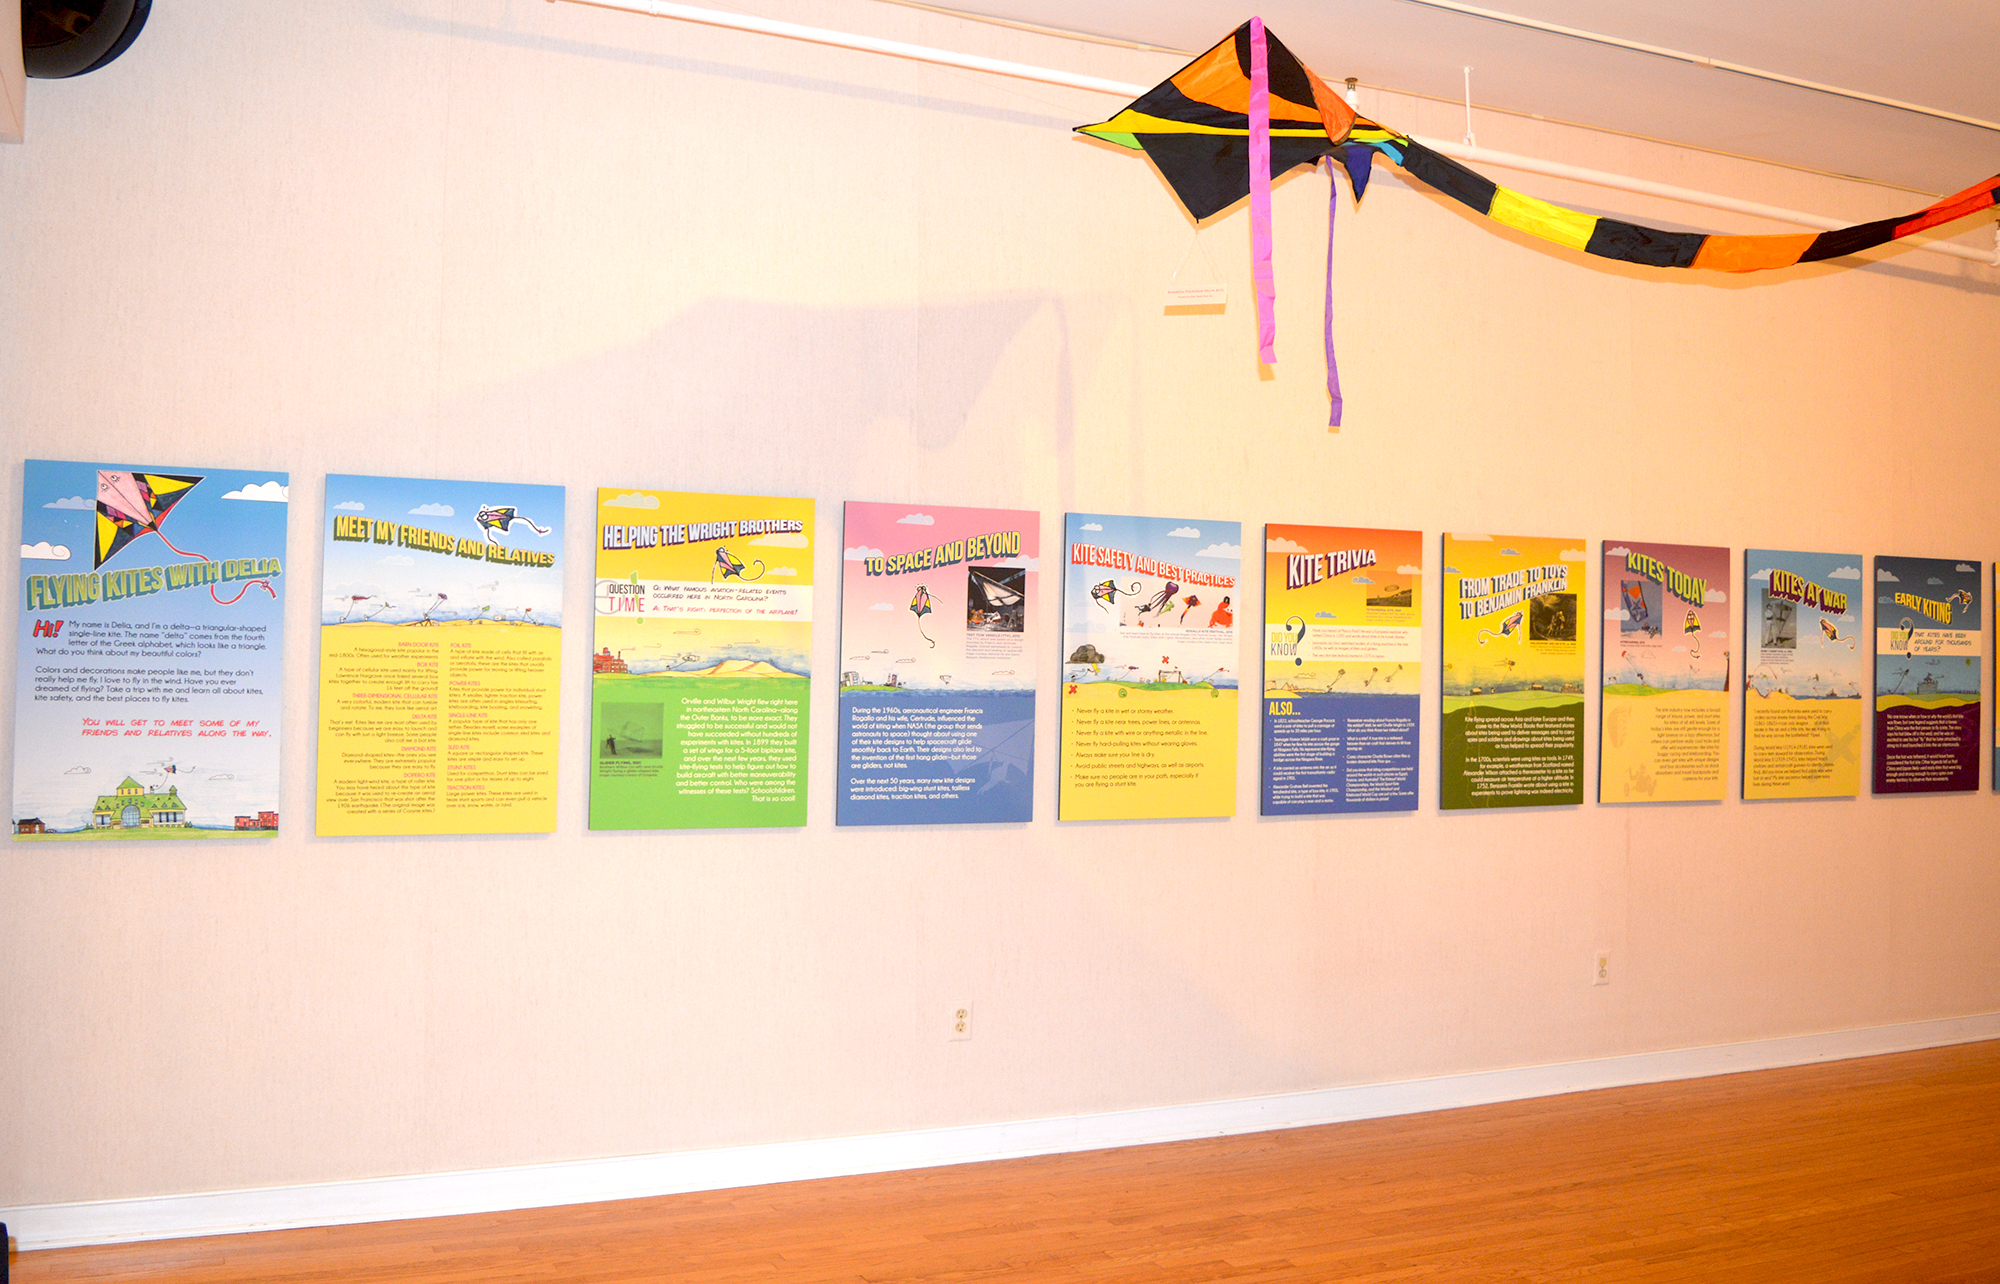 Flying Kites with Delia, traveling exhibit at Roanoke Island Festival Park